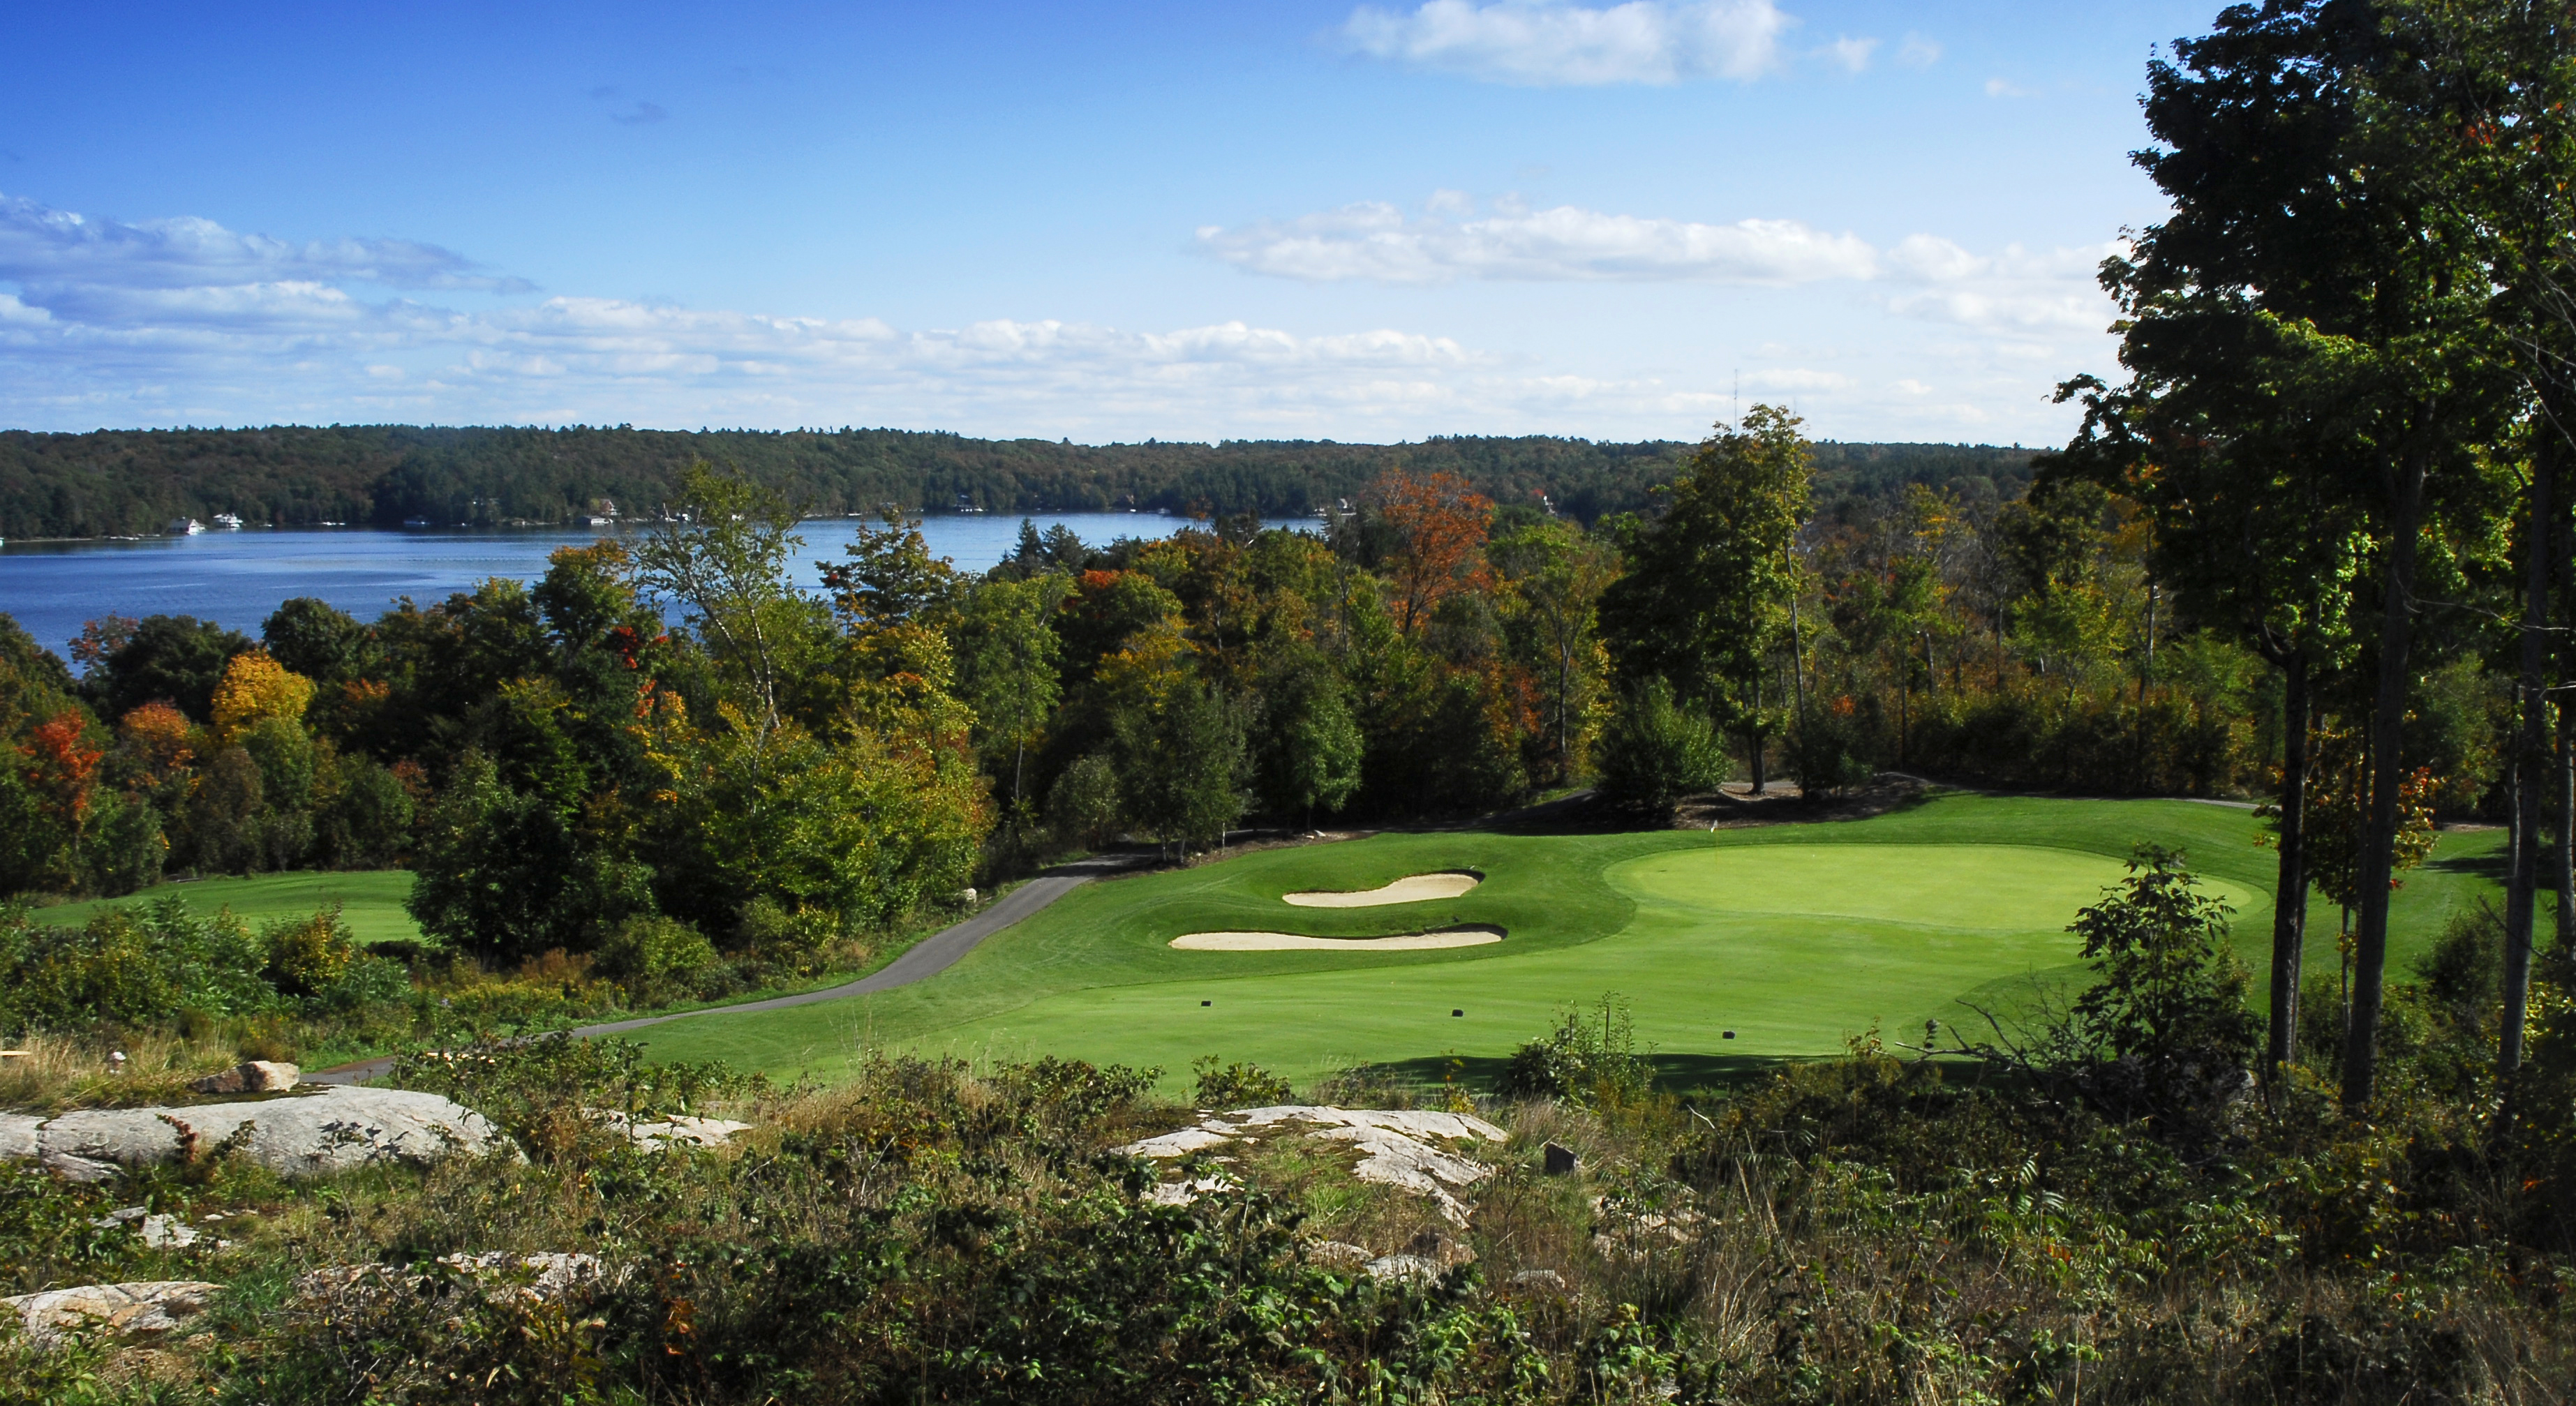 Image of Lake Joseph Golf Course